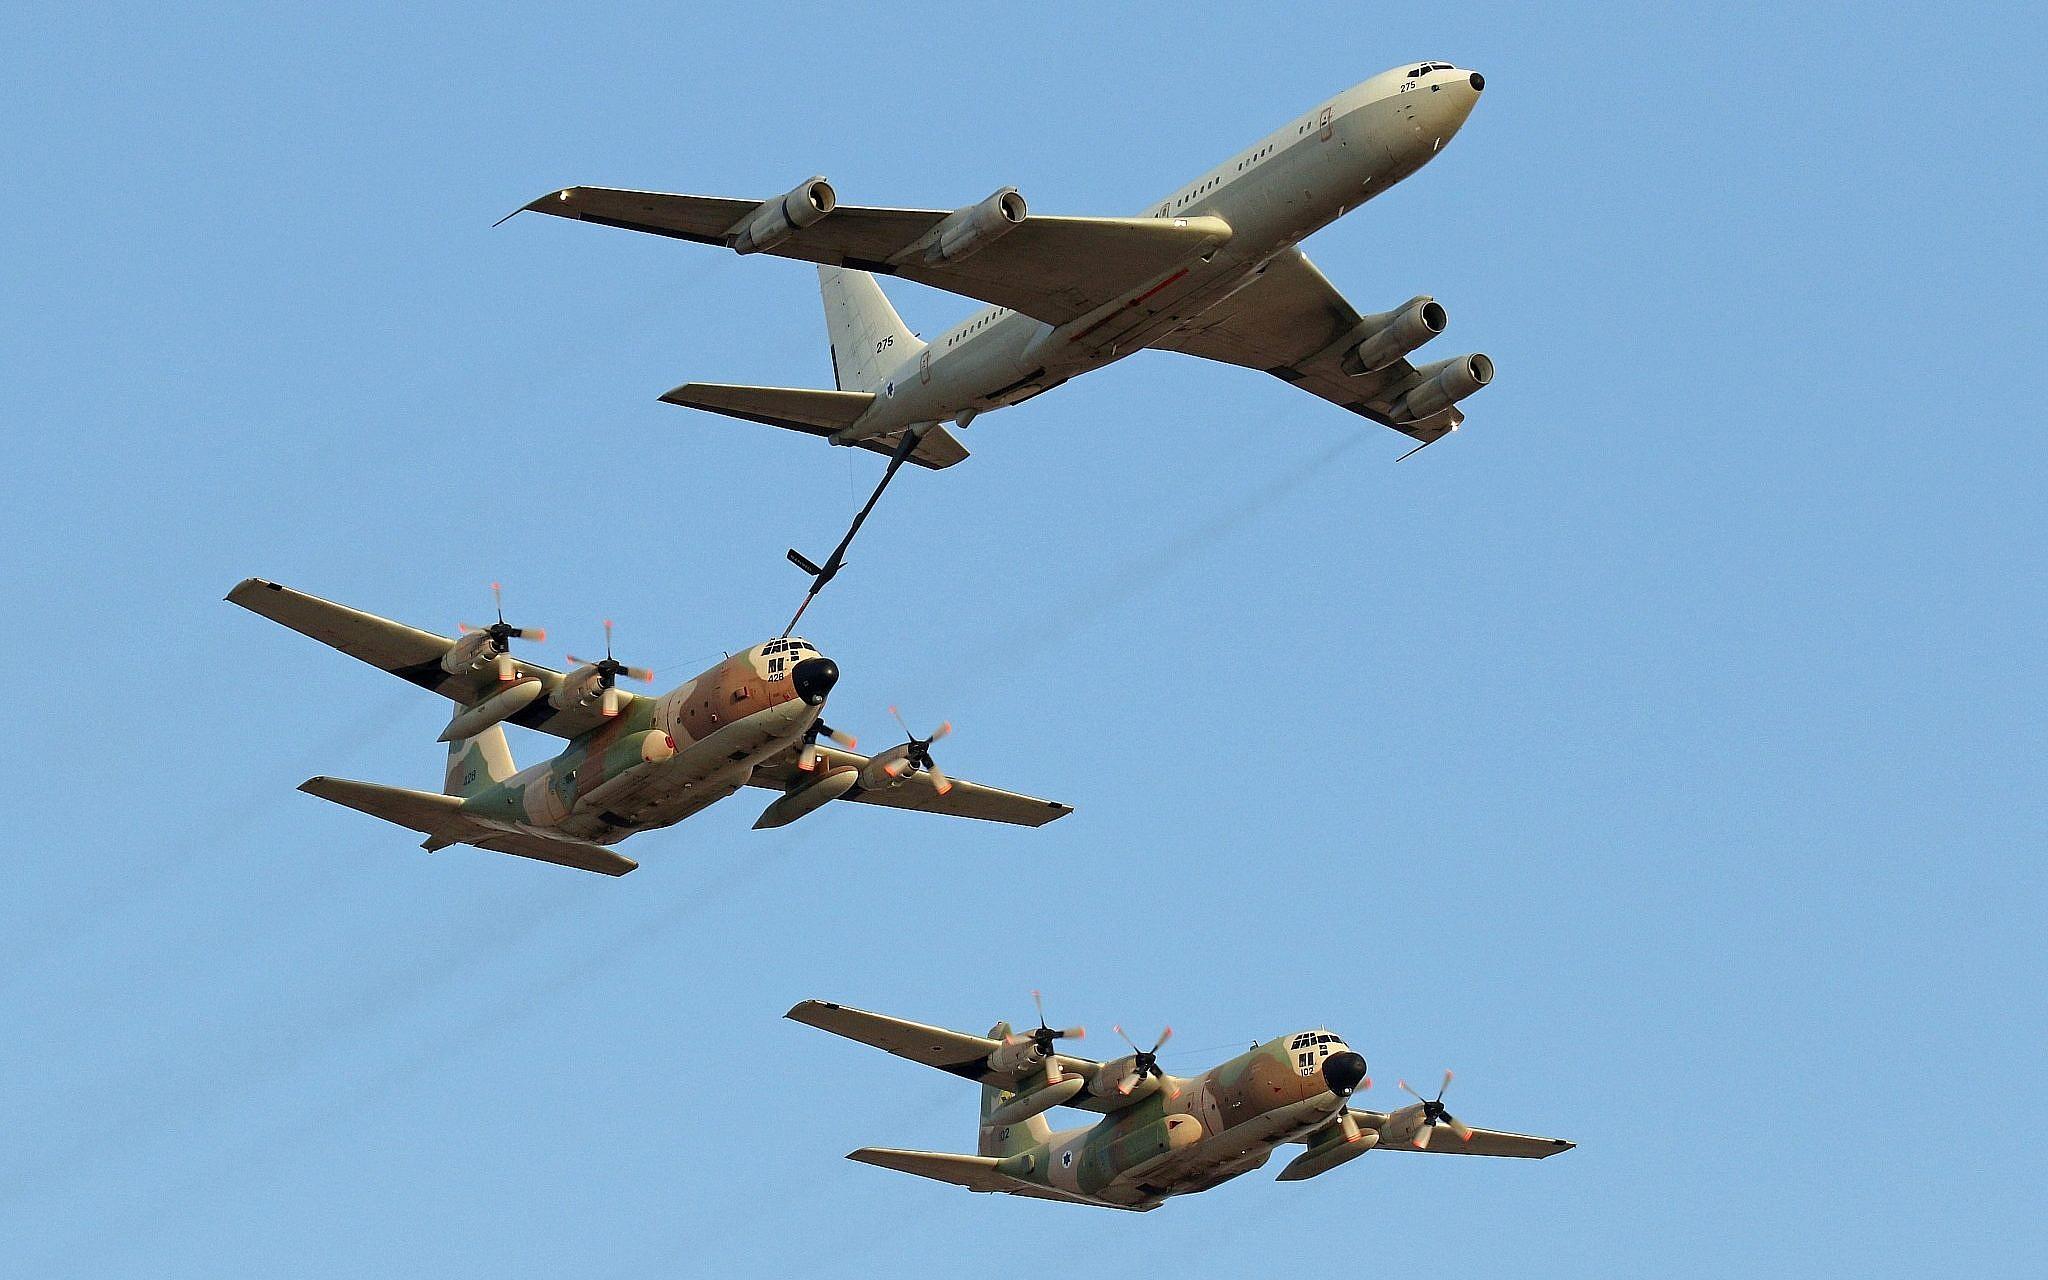 IAF returns transport, refueling planes to service after maintenance